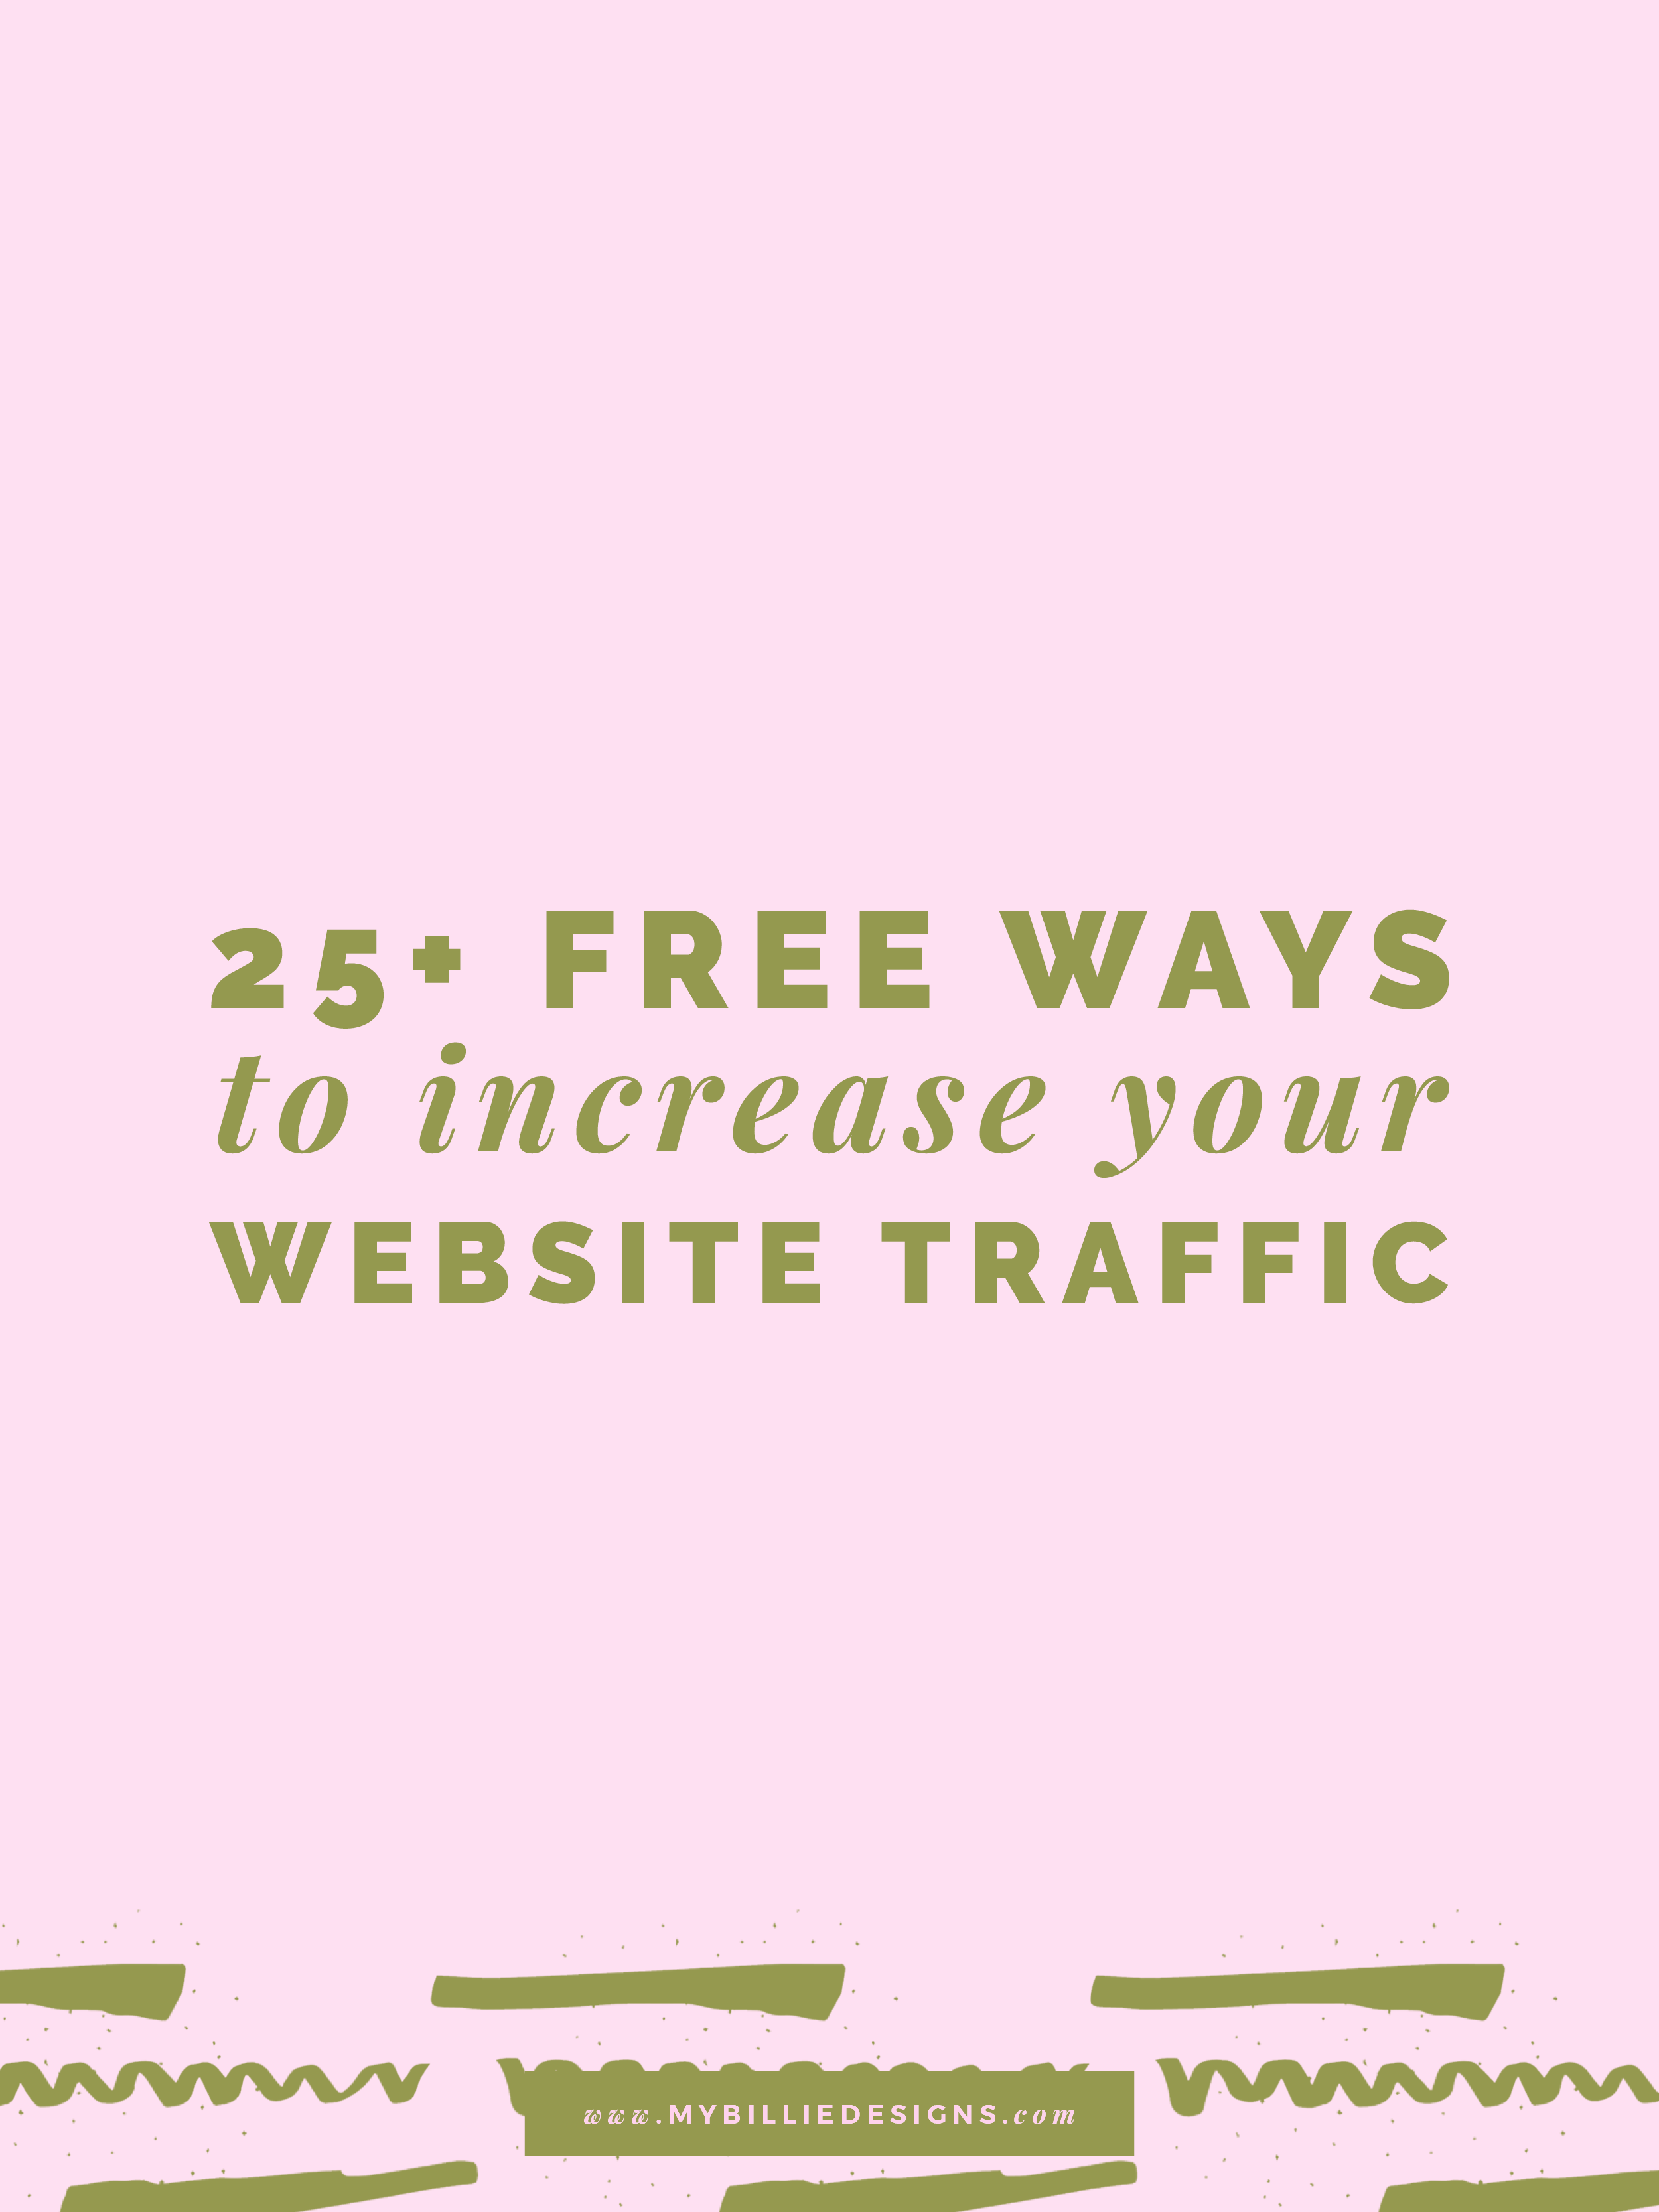 25+ Free Ways To Increase Your Website Traffic Guest Post Allie Marie Design x My Billie Design Studio